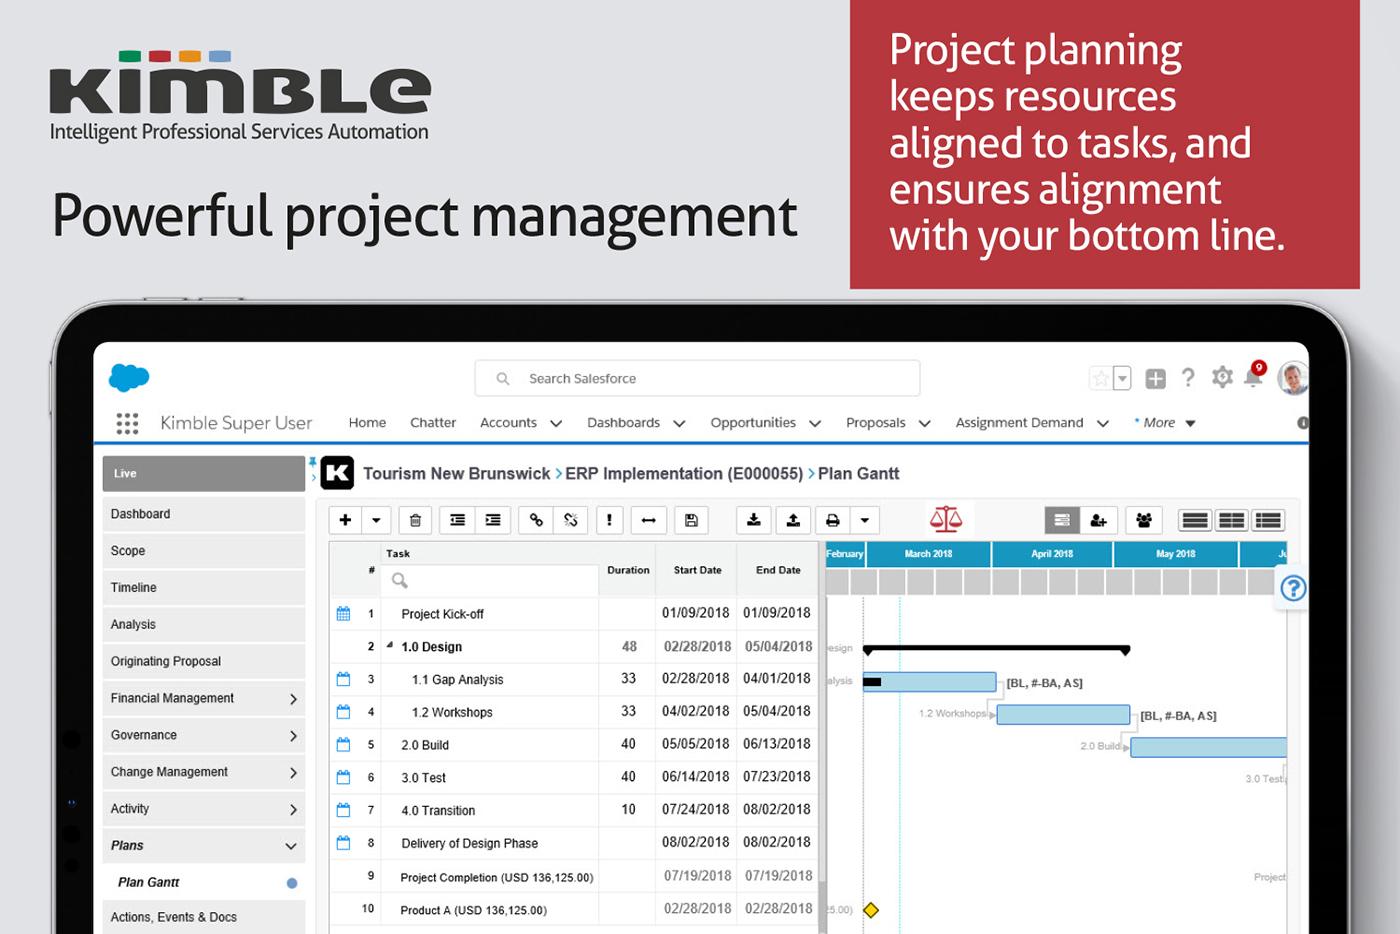 Kimble Software - 8